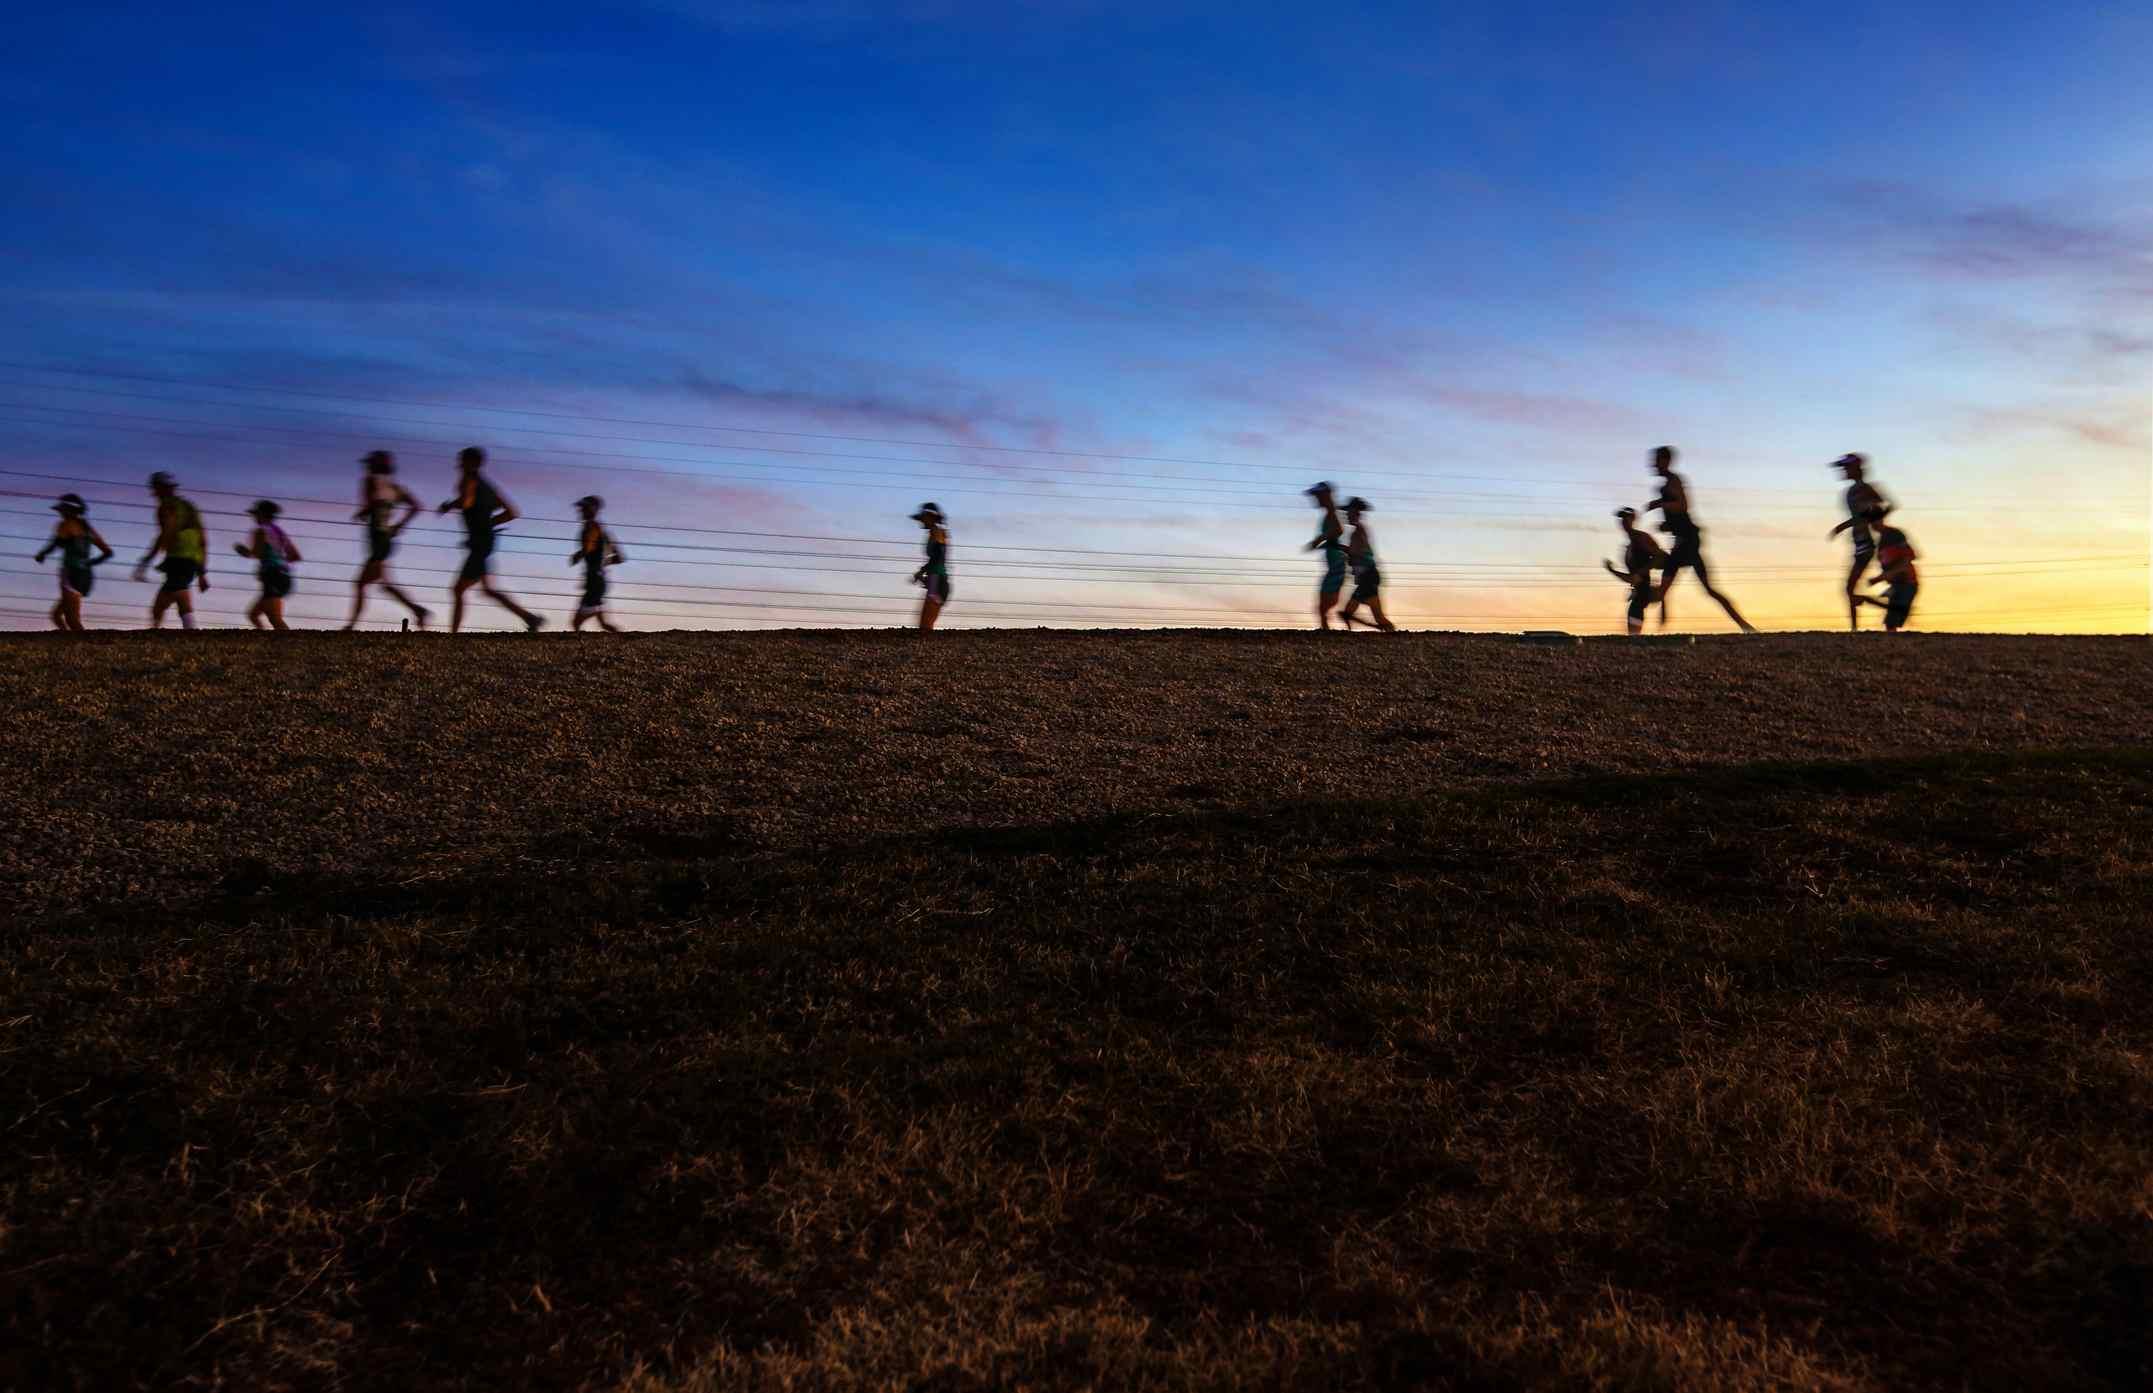 Corredores de maratón en Arizona